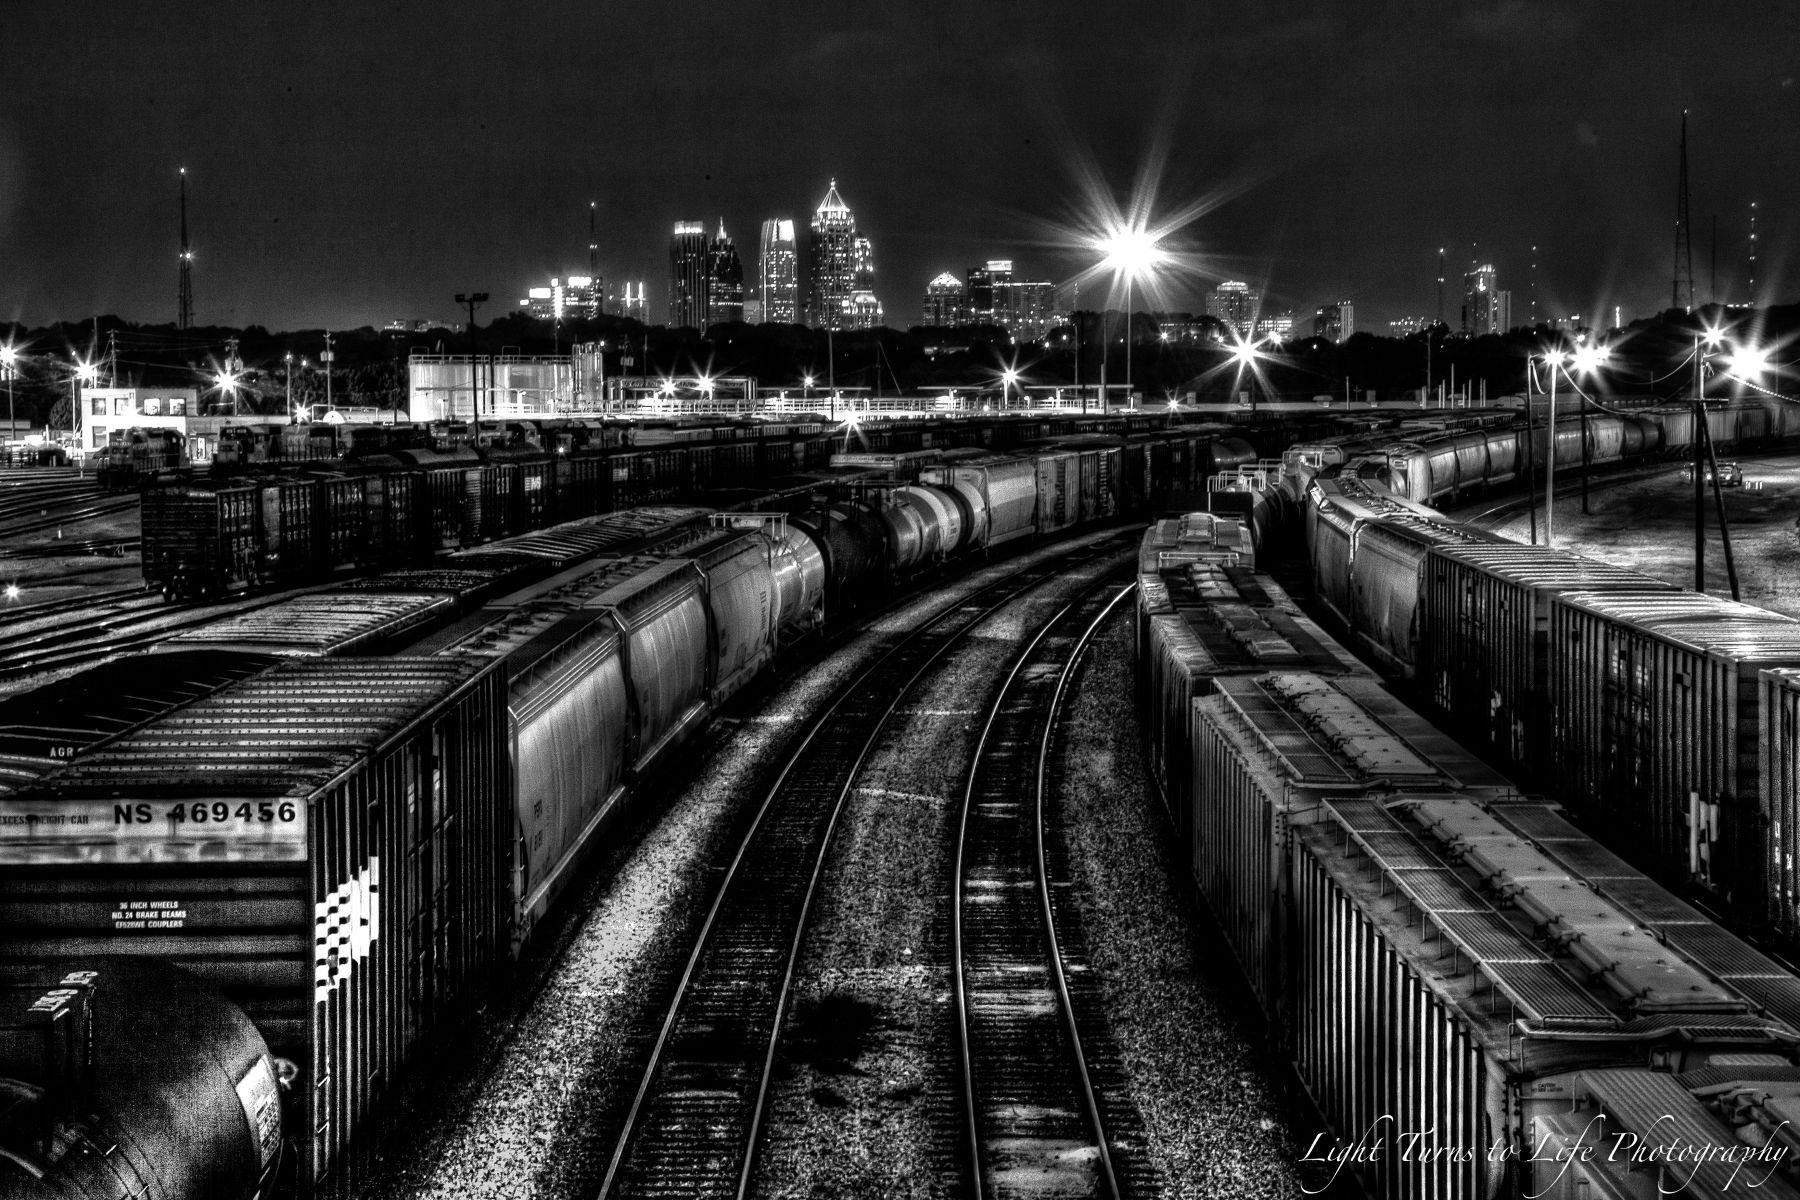 1r20120720__1207_atl_train_yard_069_tonemapped_edit120720copyright_2011_vinson_smith